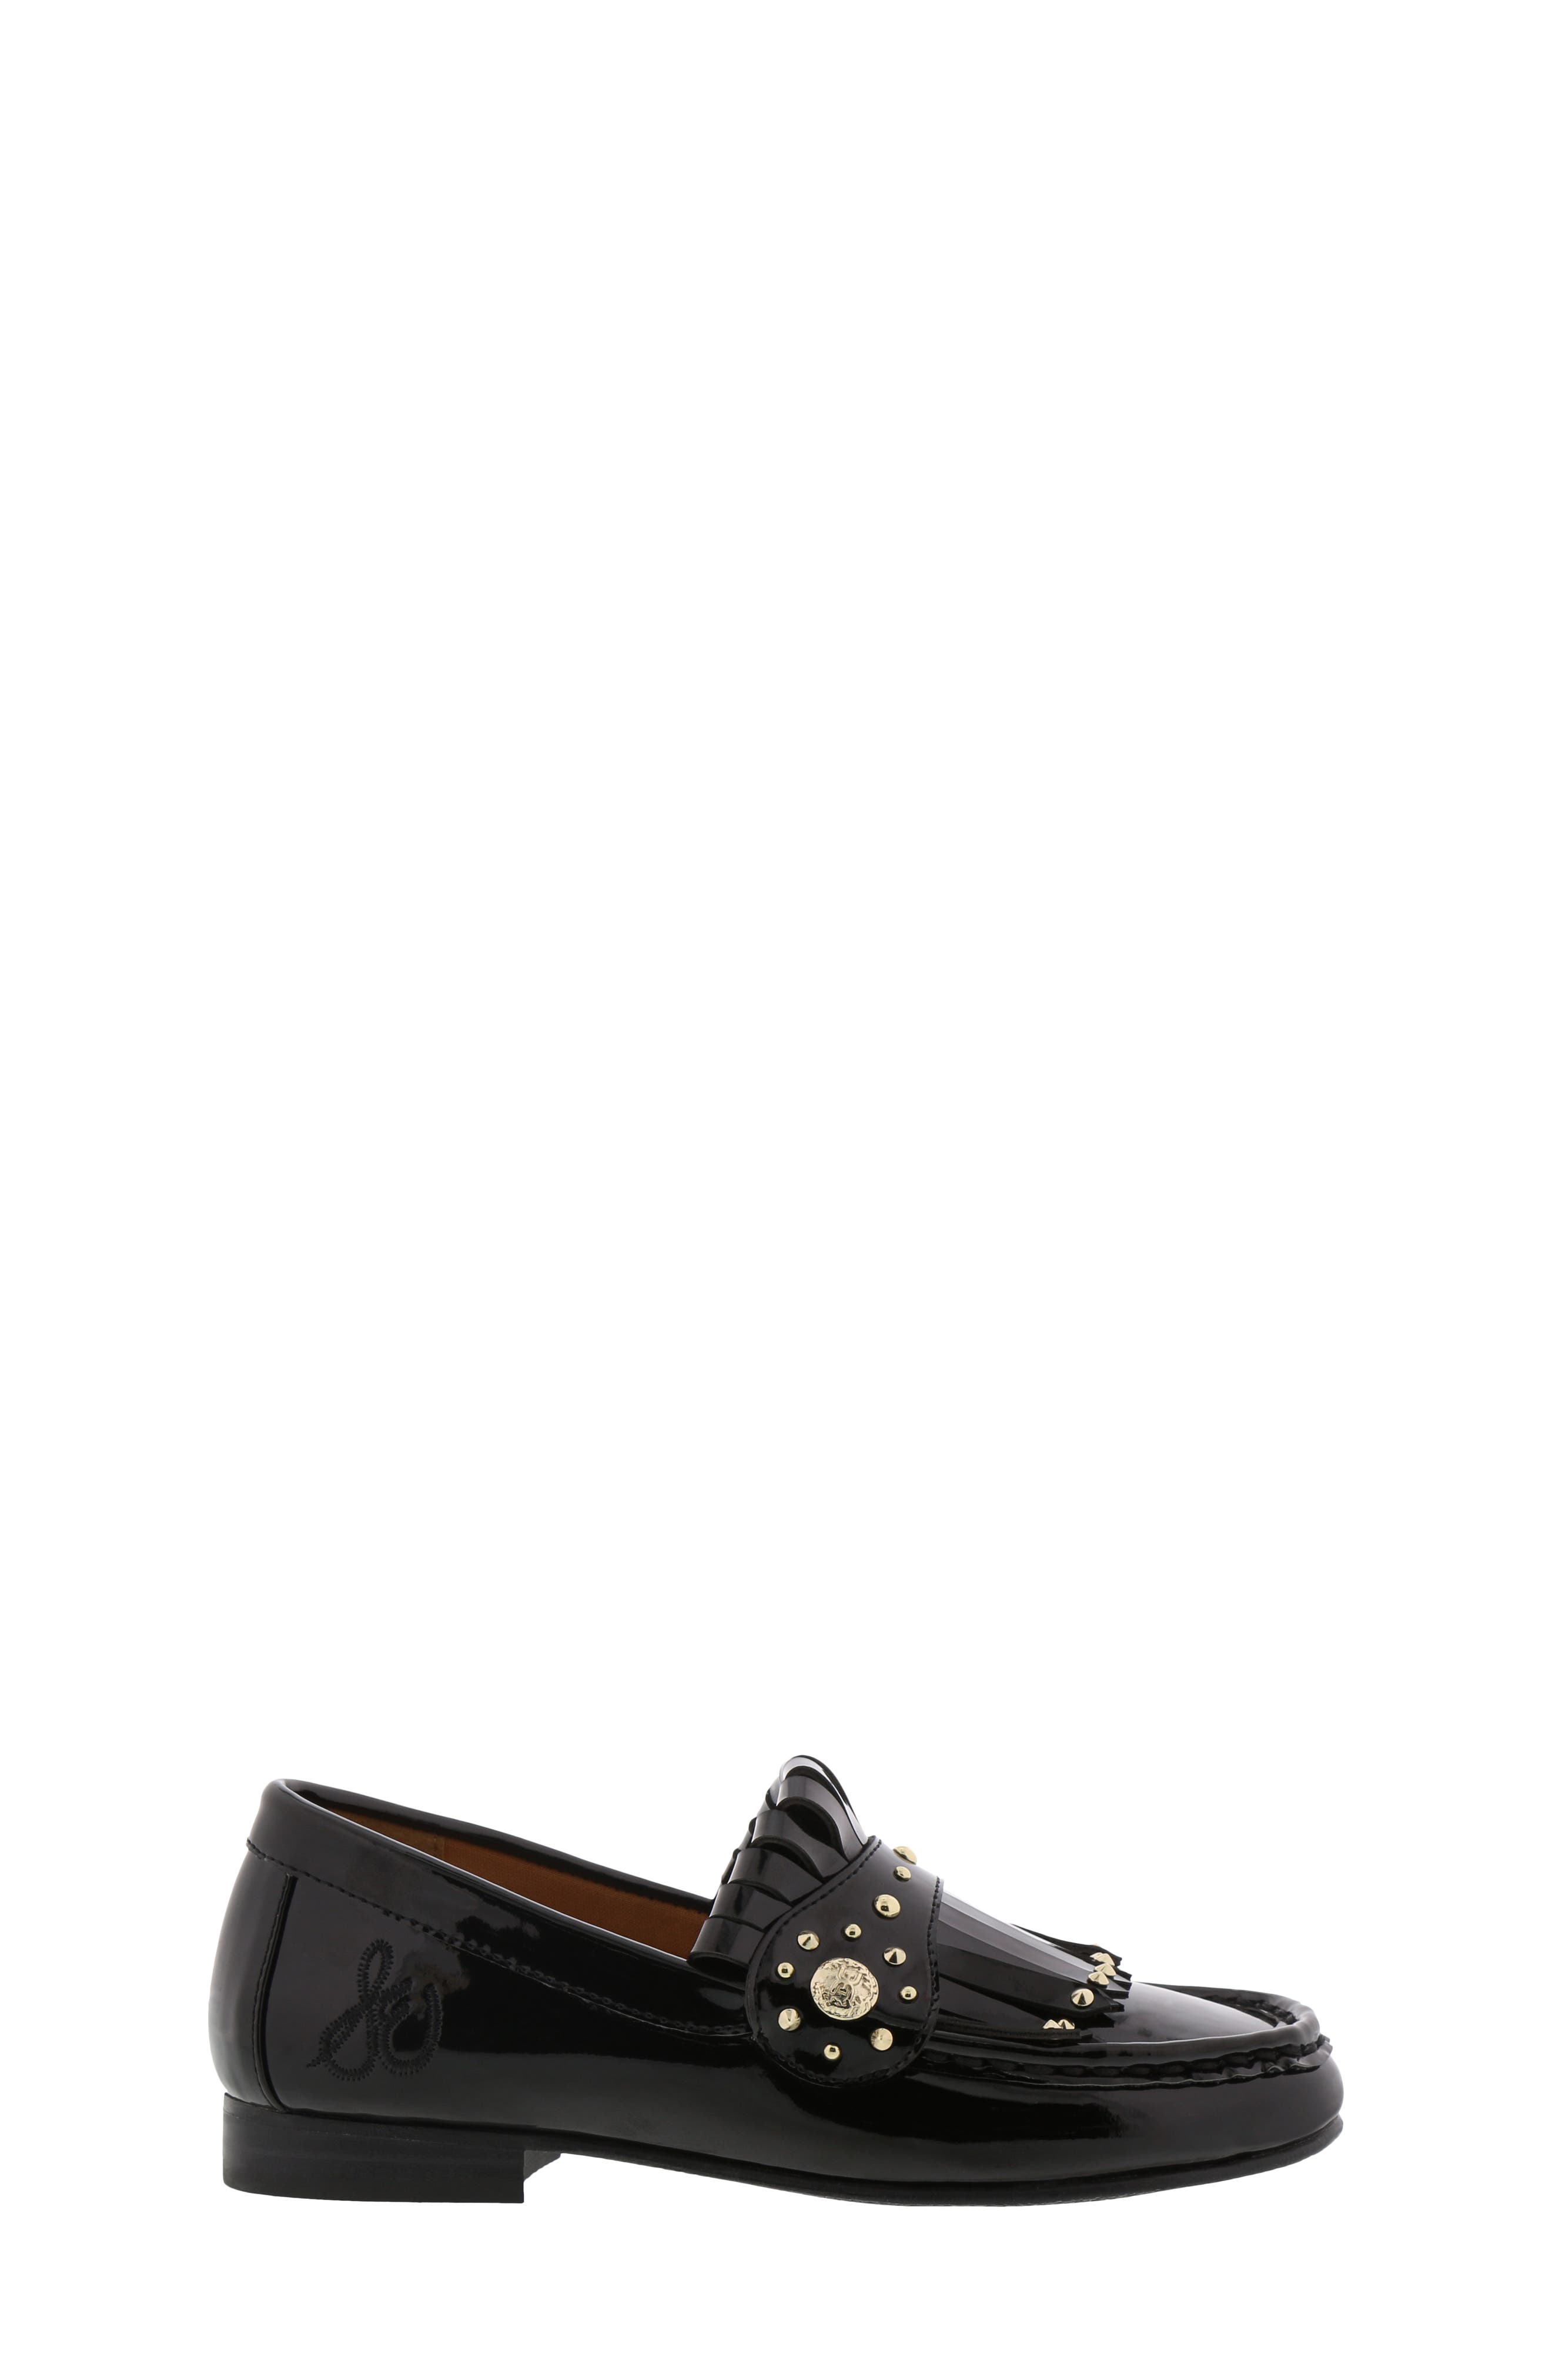 Gabriella Serona Studded Kiltie Loafer,                             Alternate thumbnail 3, color,                             BLACK